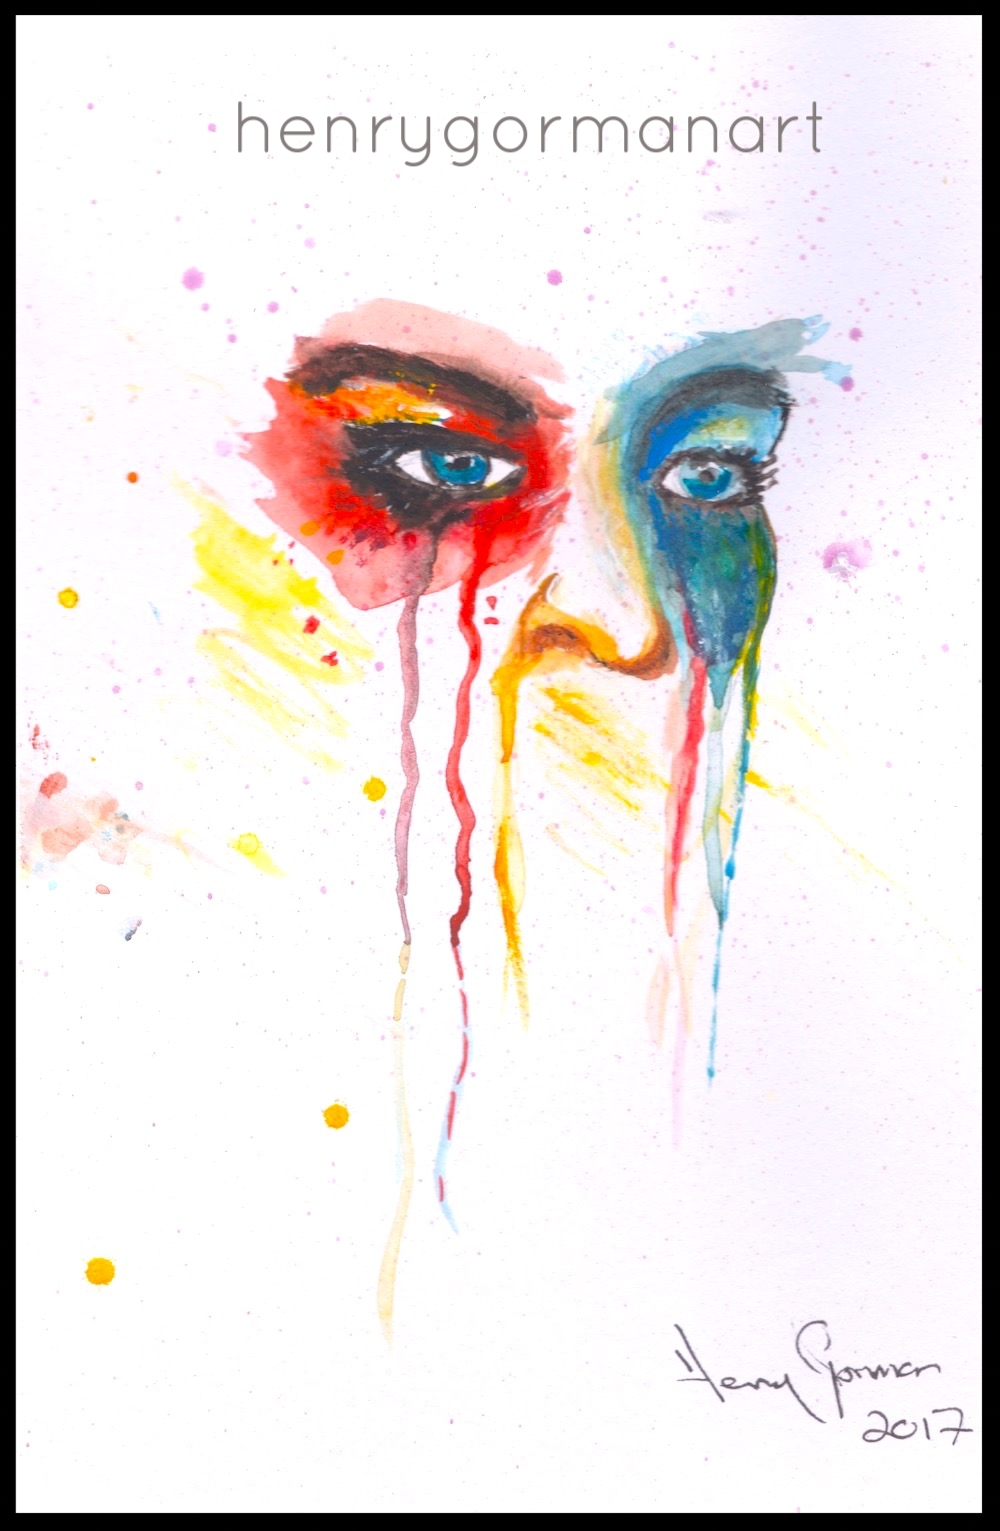 'Abstract tears'